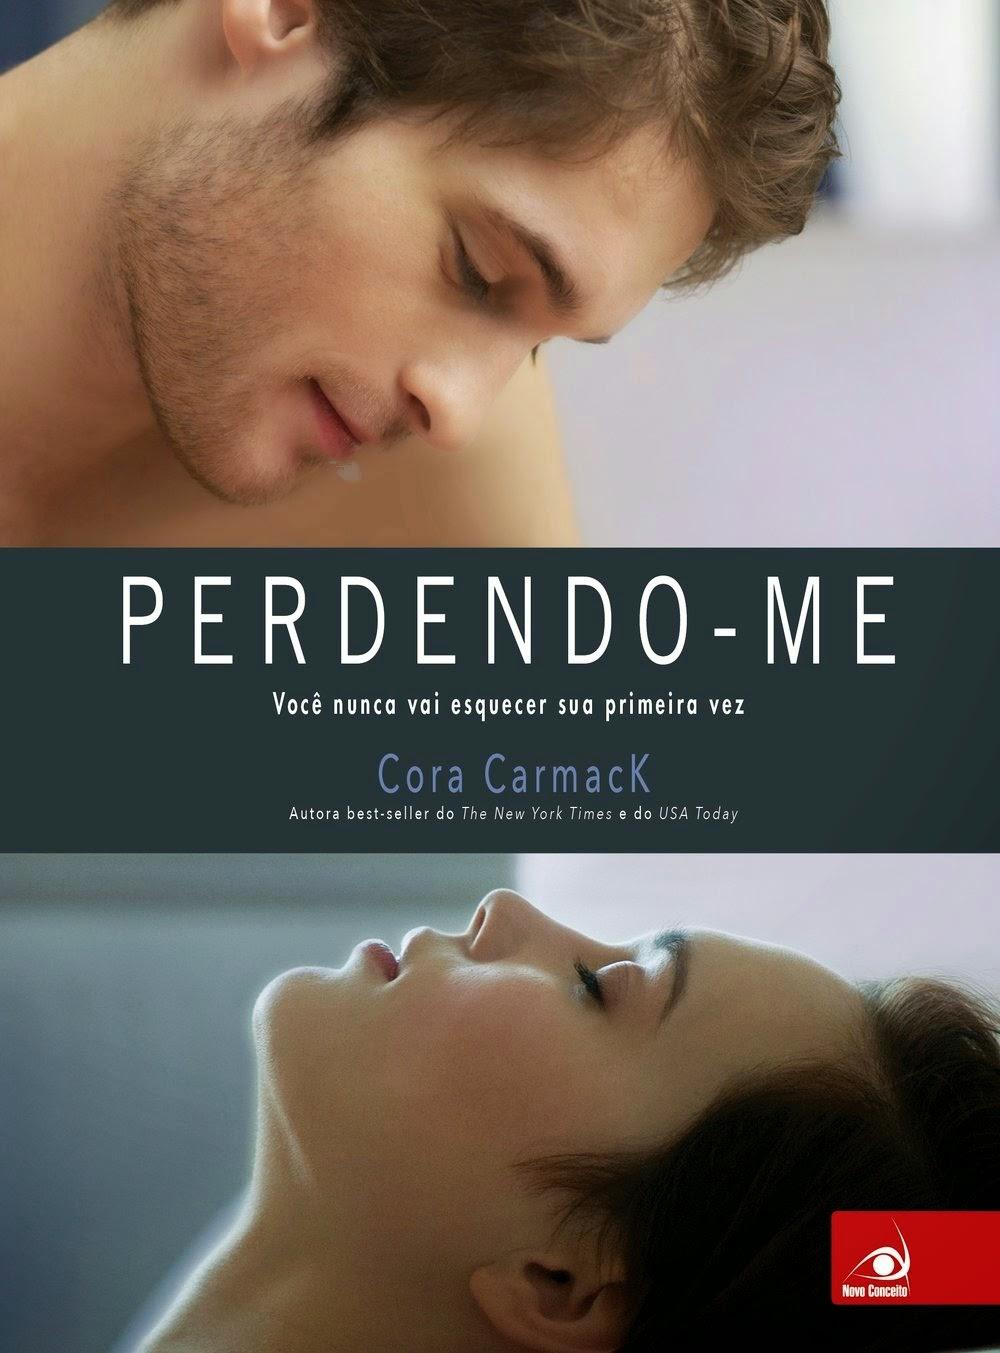 [Resenha] Perdendo-me   -   Cora Carmack